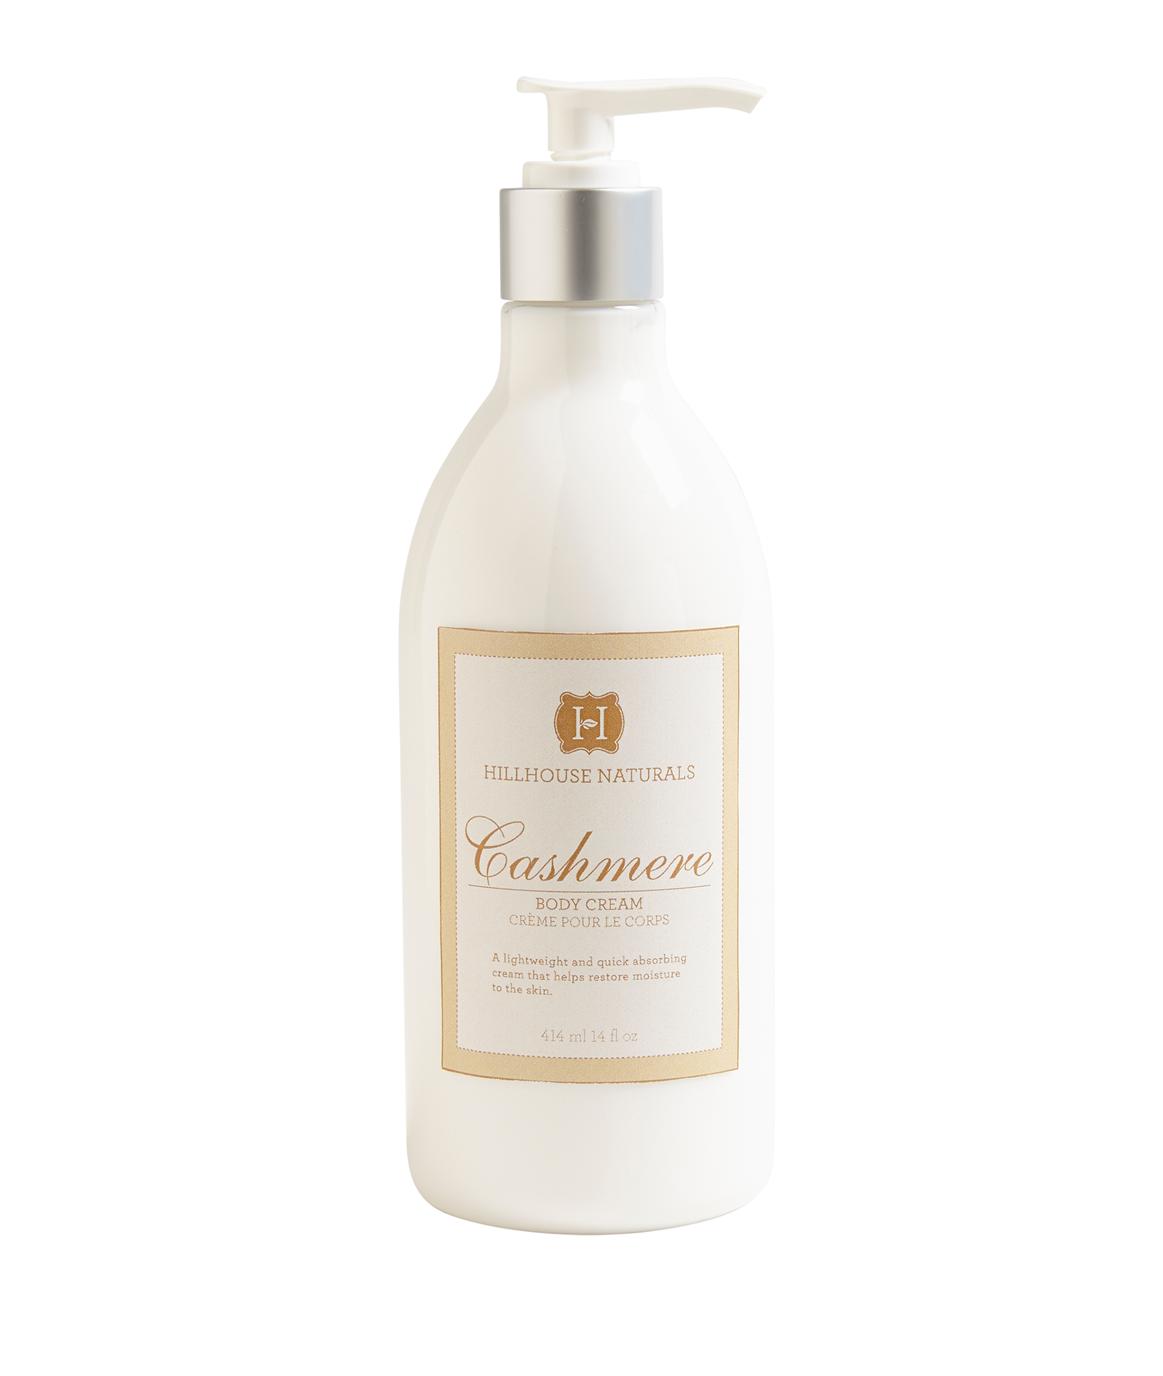 Cashmere Body Creme 14 oz by Hillhouse Naturals